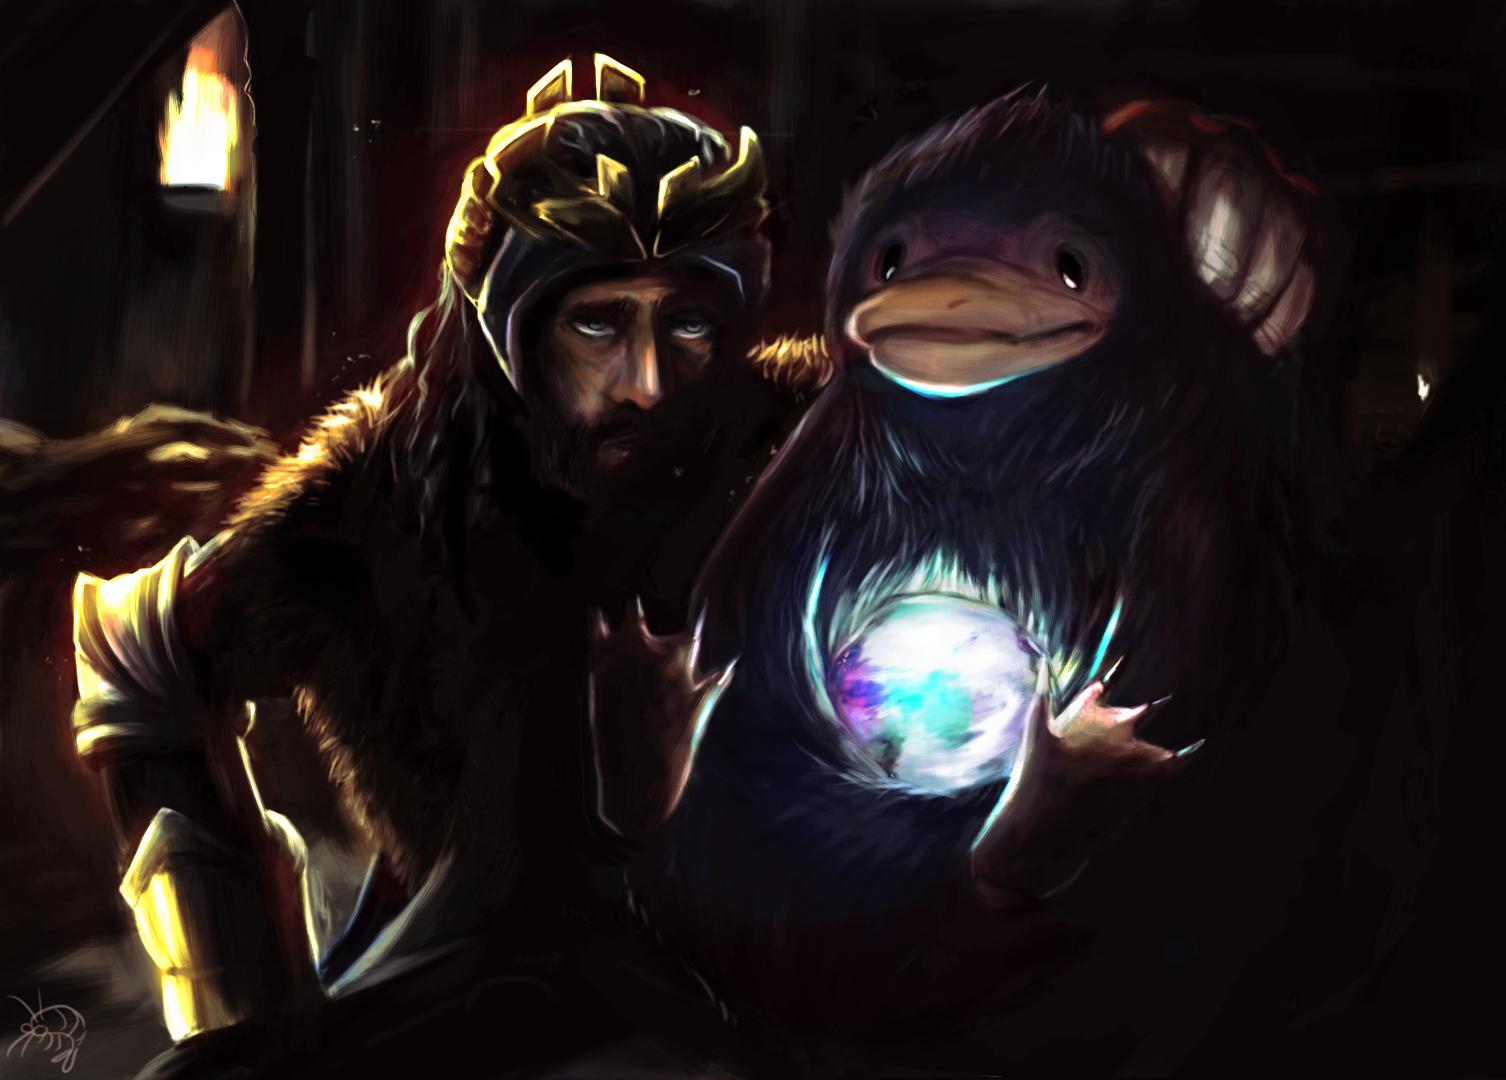 The Dwarf And the Burglar